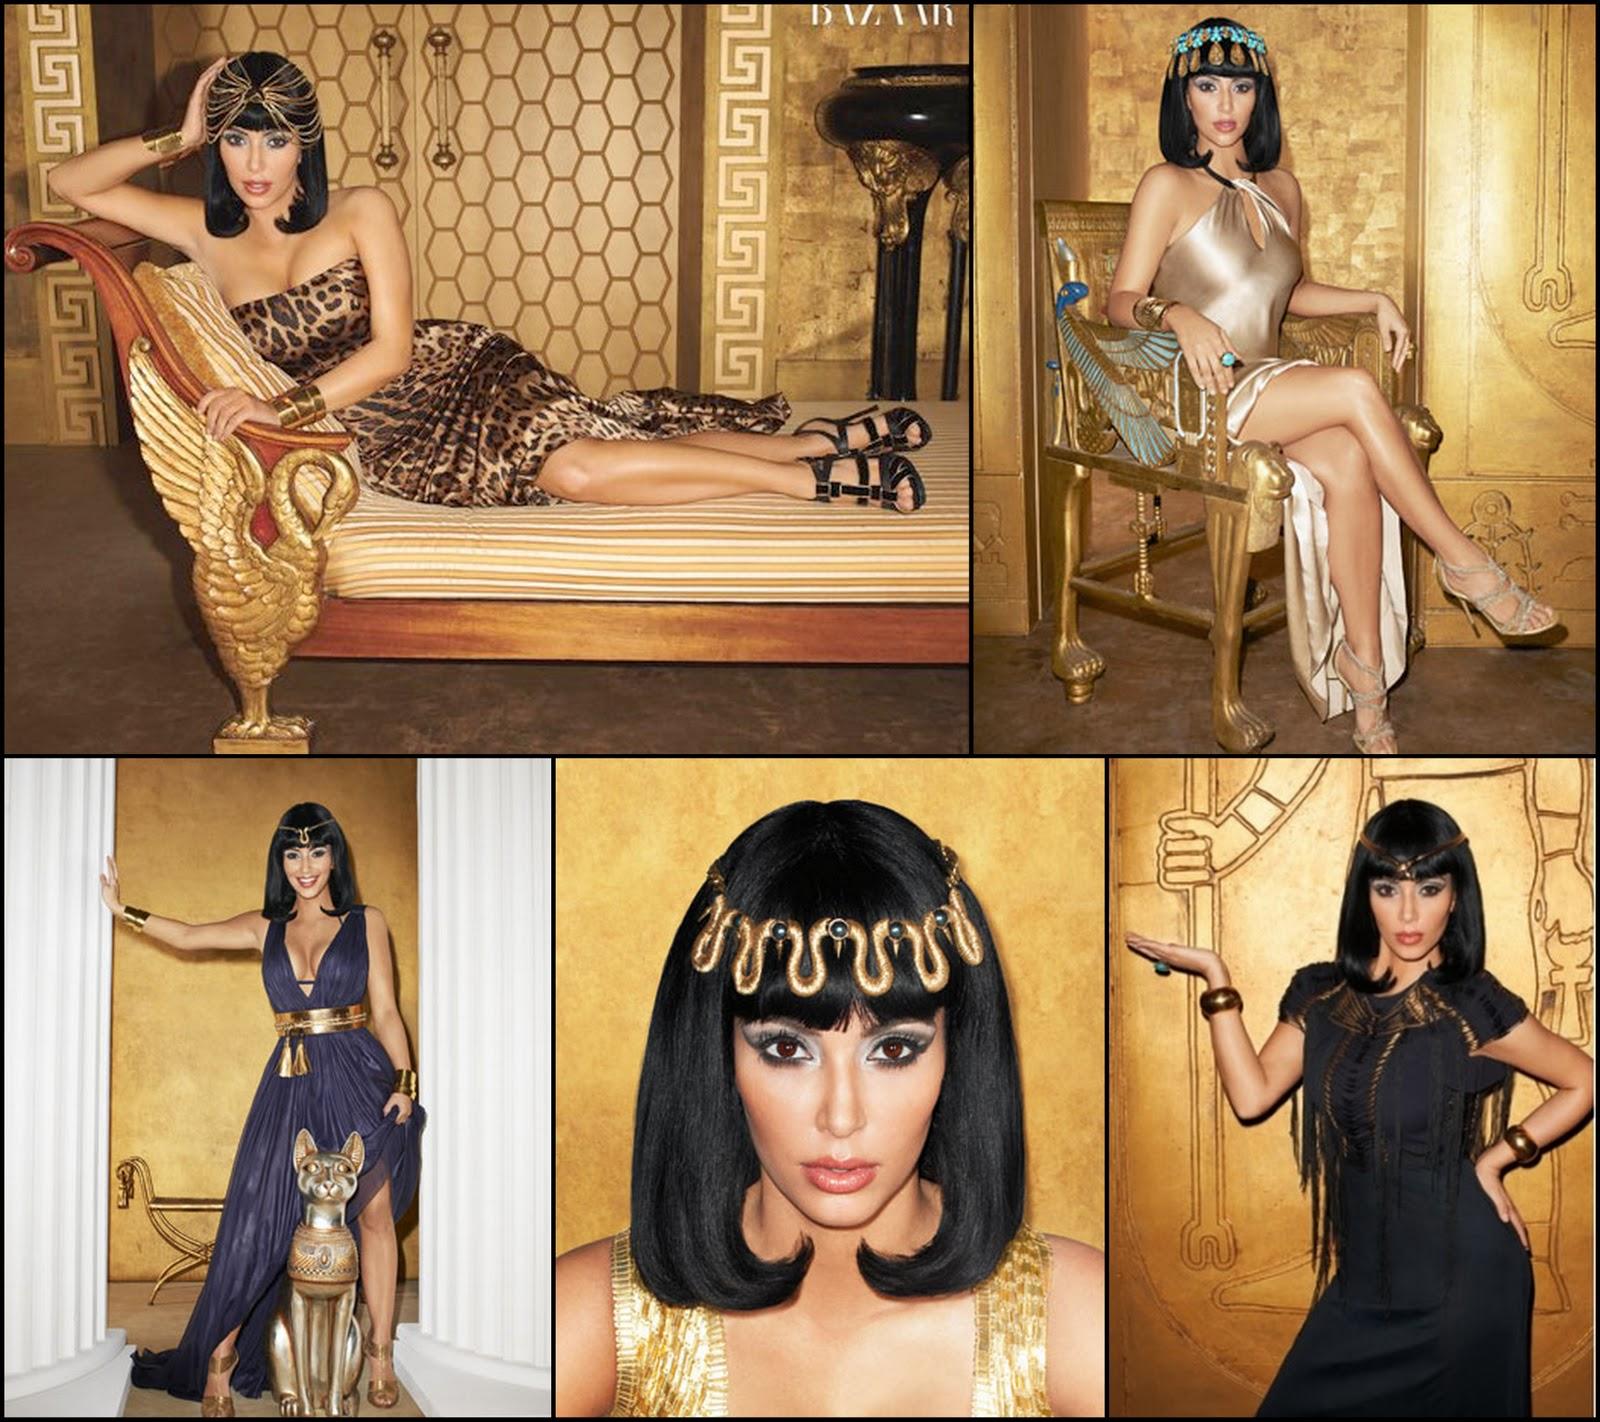 http://1.bp.blogspot.com/-1Q6vRMpgEYY/TVXBT8PpmPI/AAAAAAAAAPE/cLZ74I2EERQ/s1600/Kim+Kardashian+covergirl.jpg